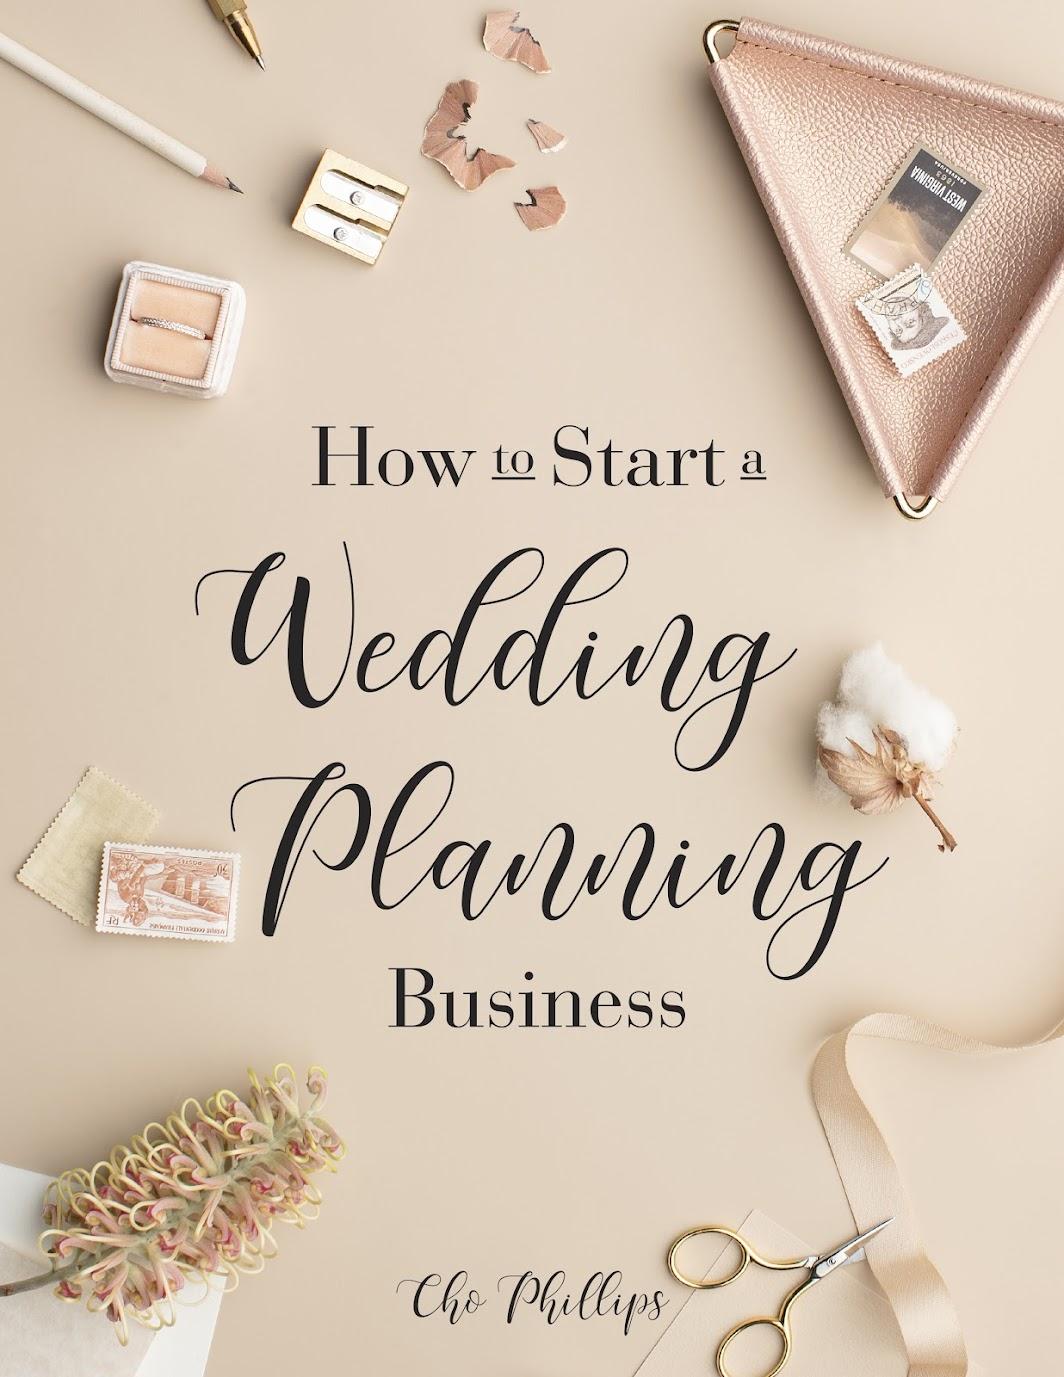 Wedding-planning-business-ebook